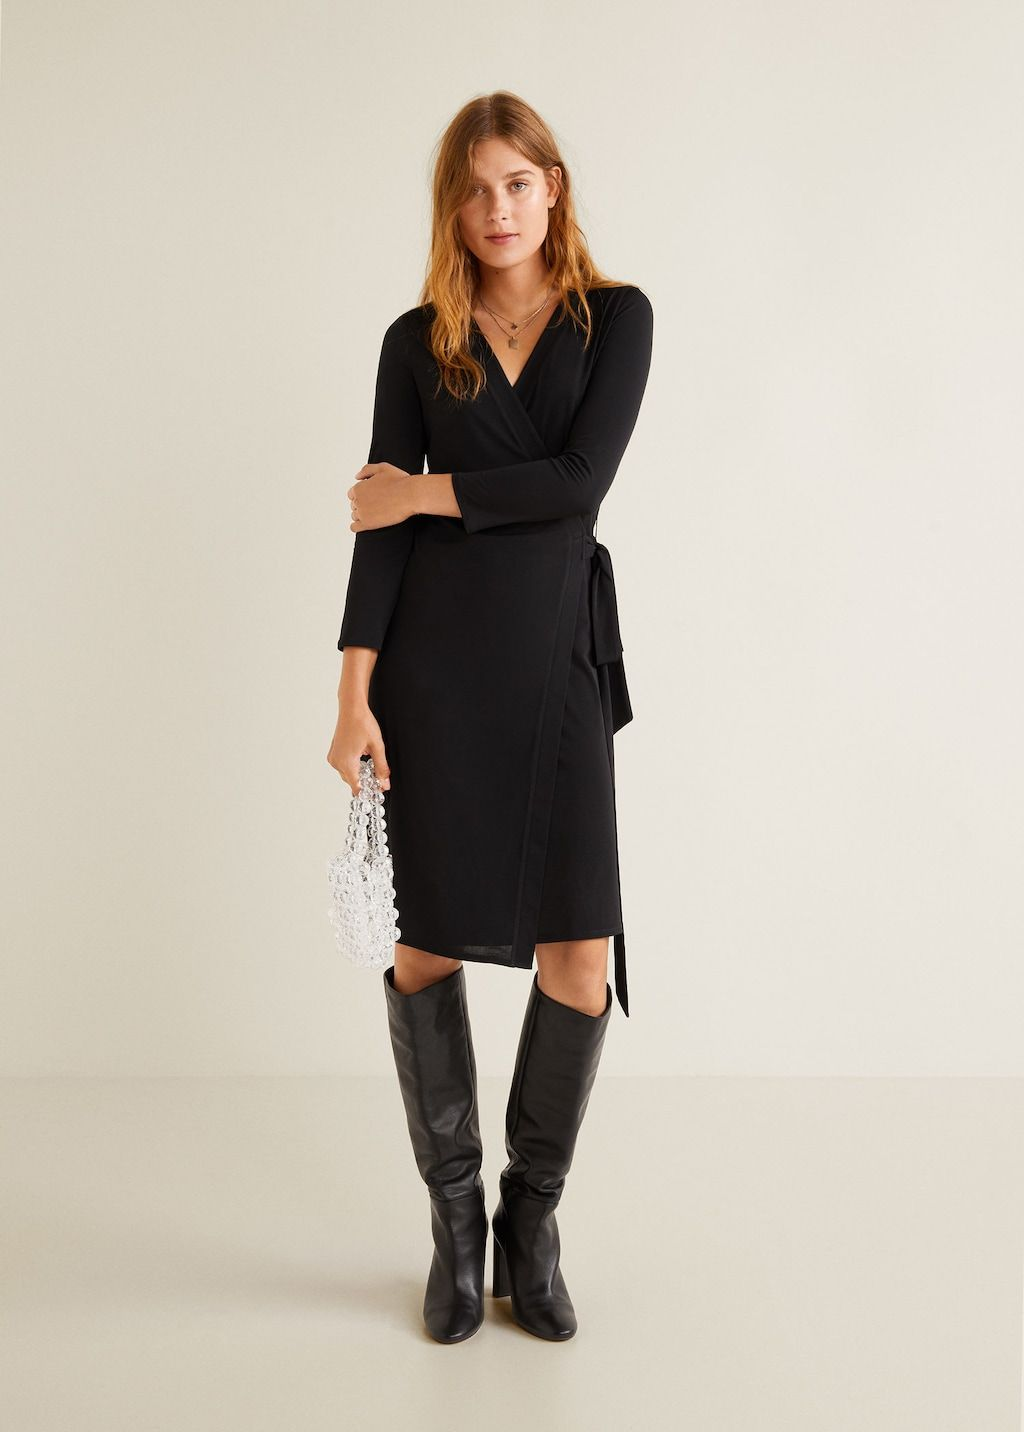 b2341e9cfc73 Φόρεμα κρουαζέ με φιόγκο - Γυναίκα